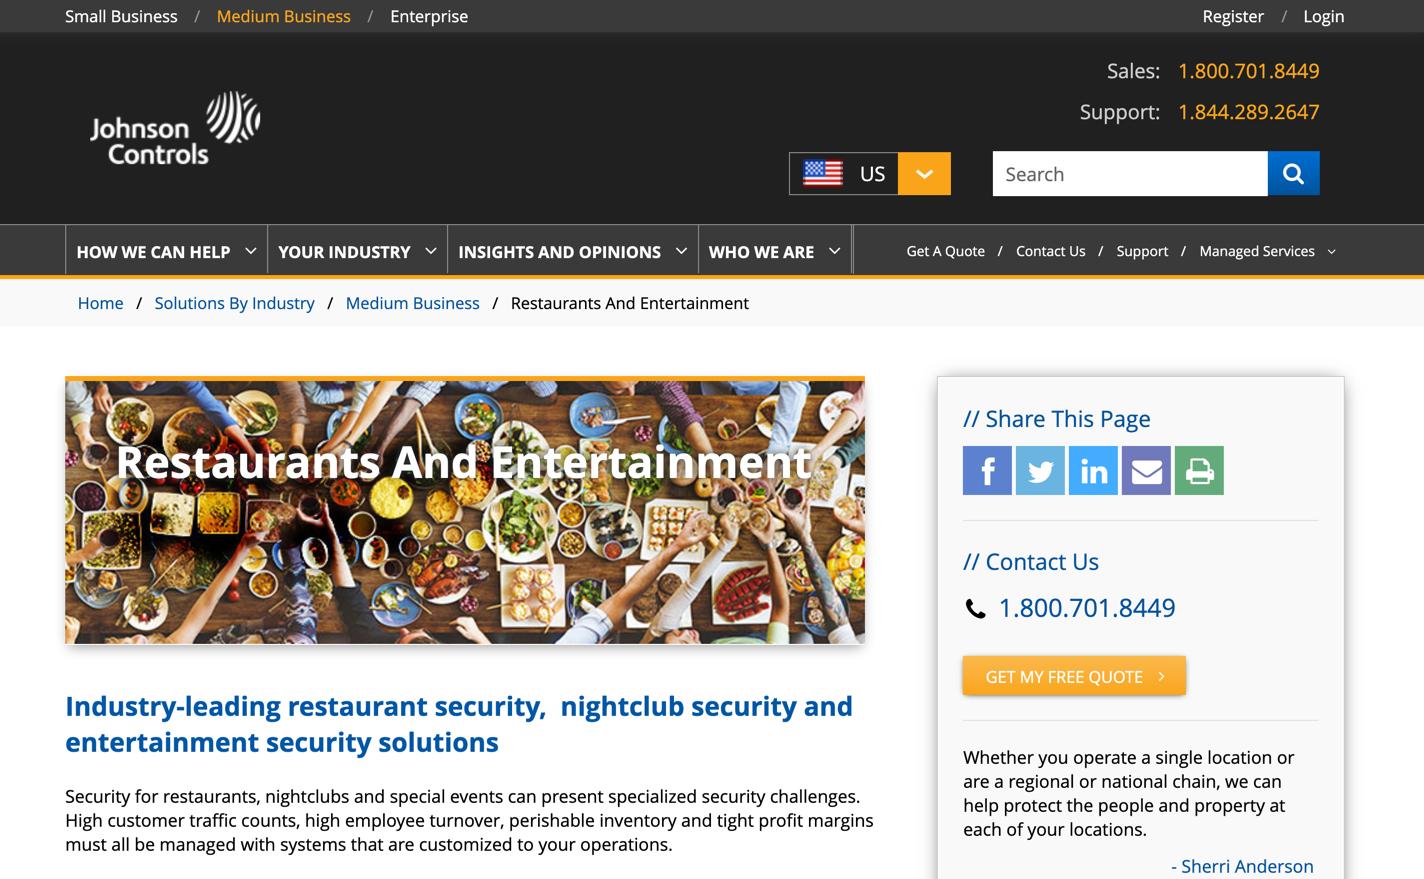 johnsoncontrols homepage